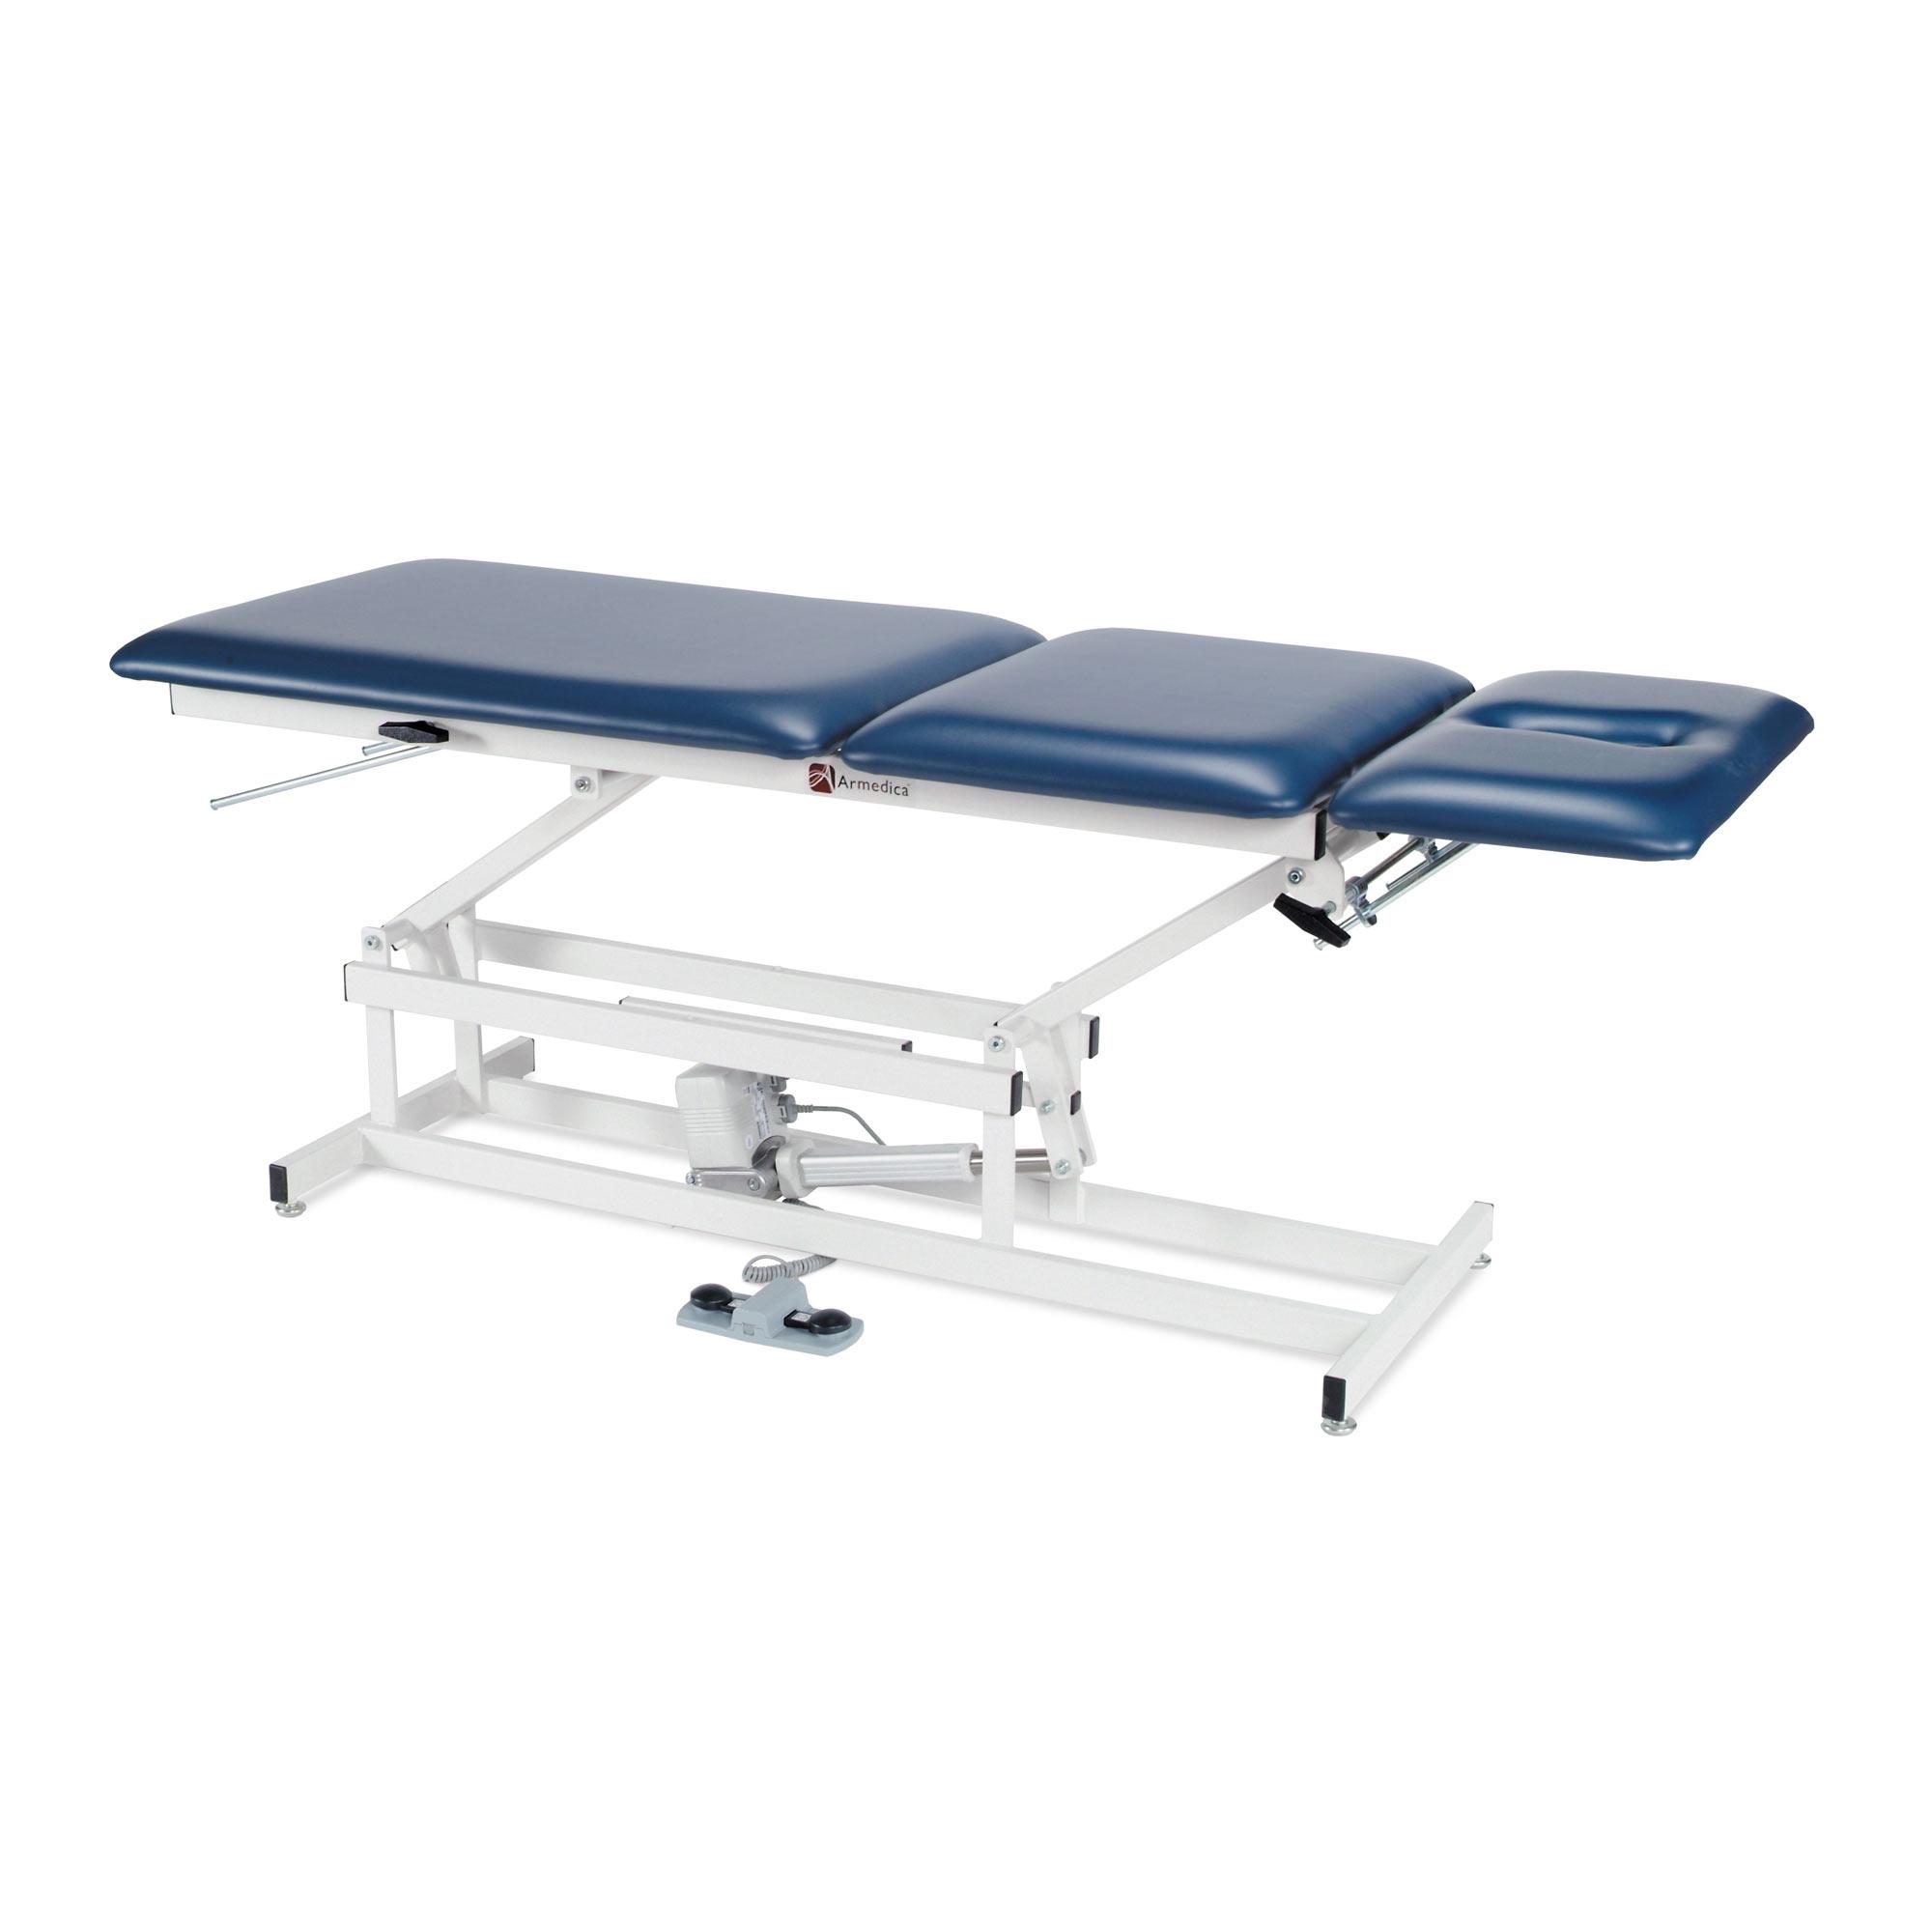 Armedica AM-300 treatment table